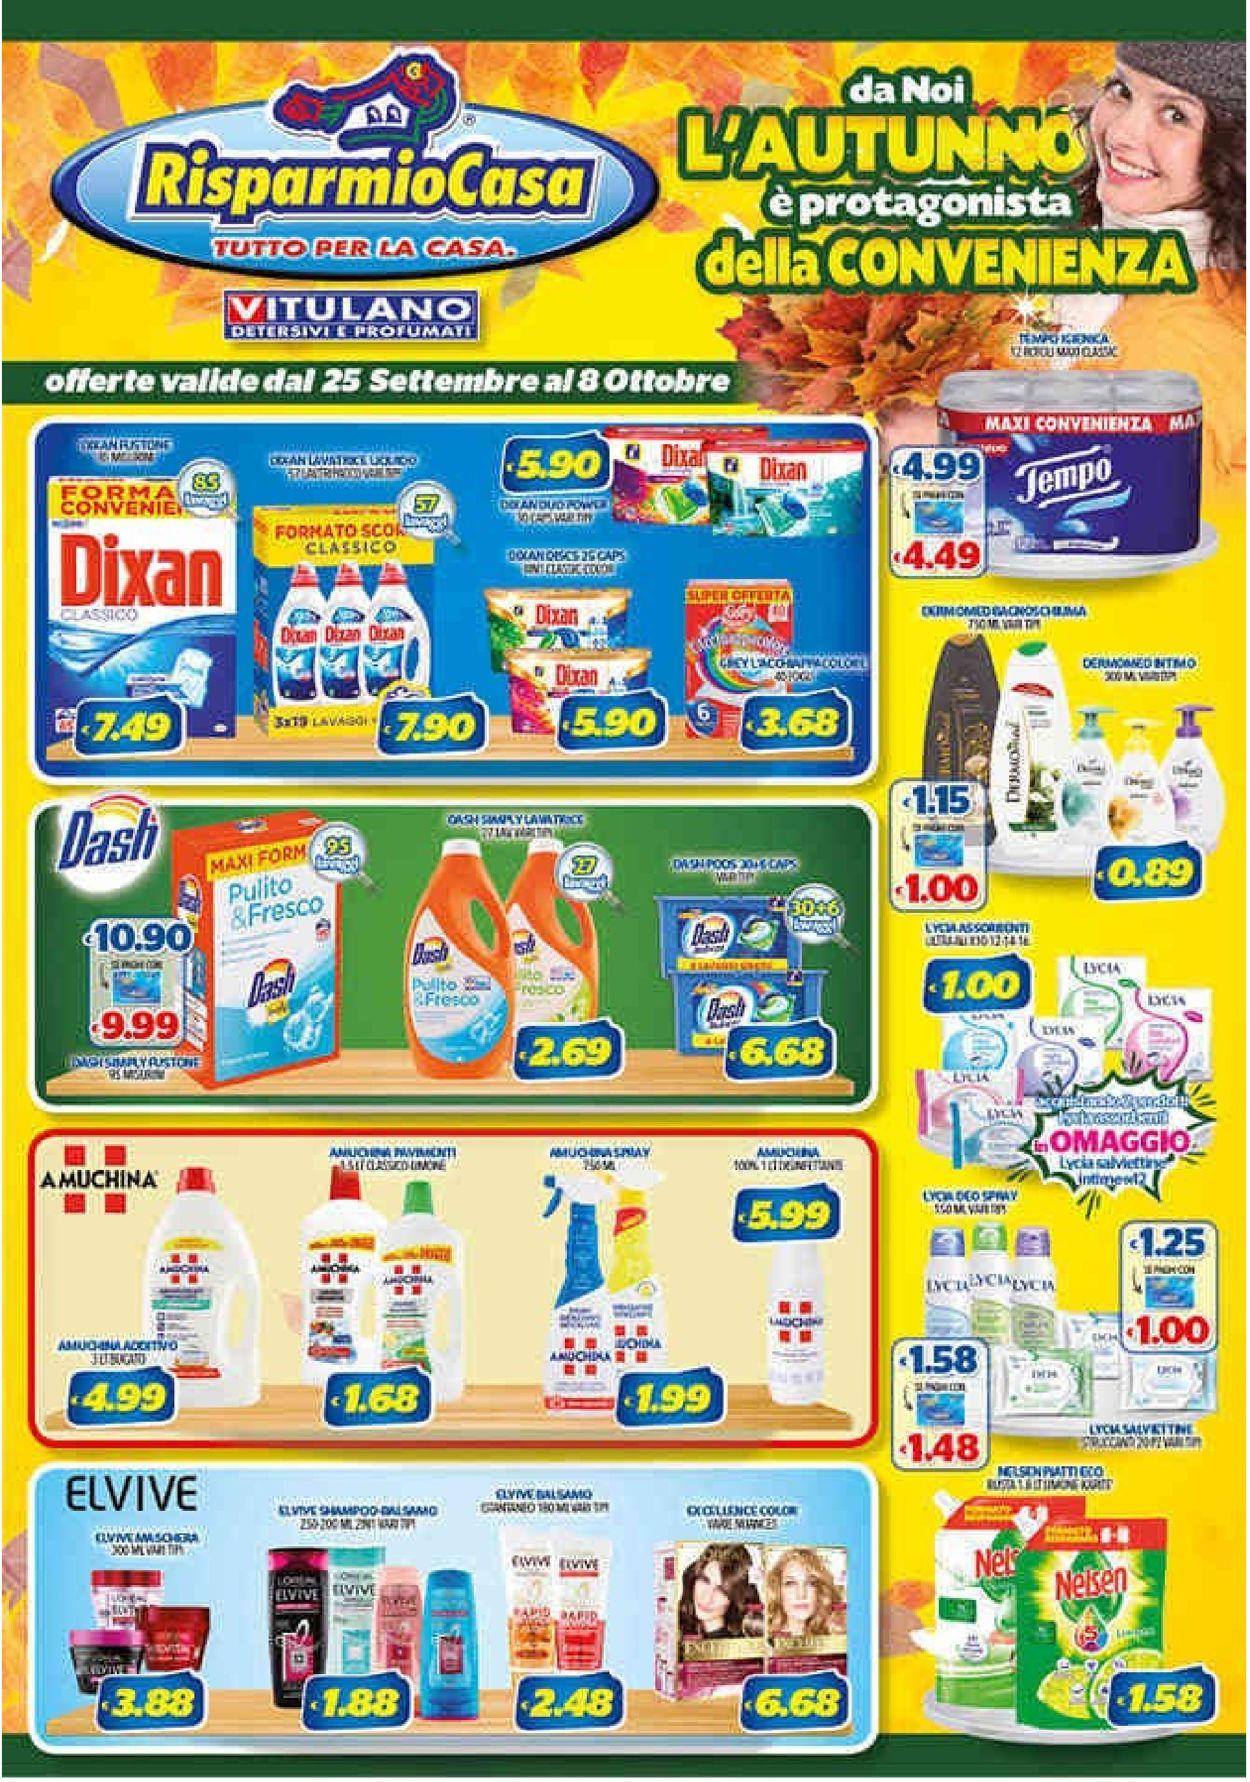 Volantino Risparmio Casa - Offerte 25/09-08/10/2019